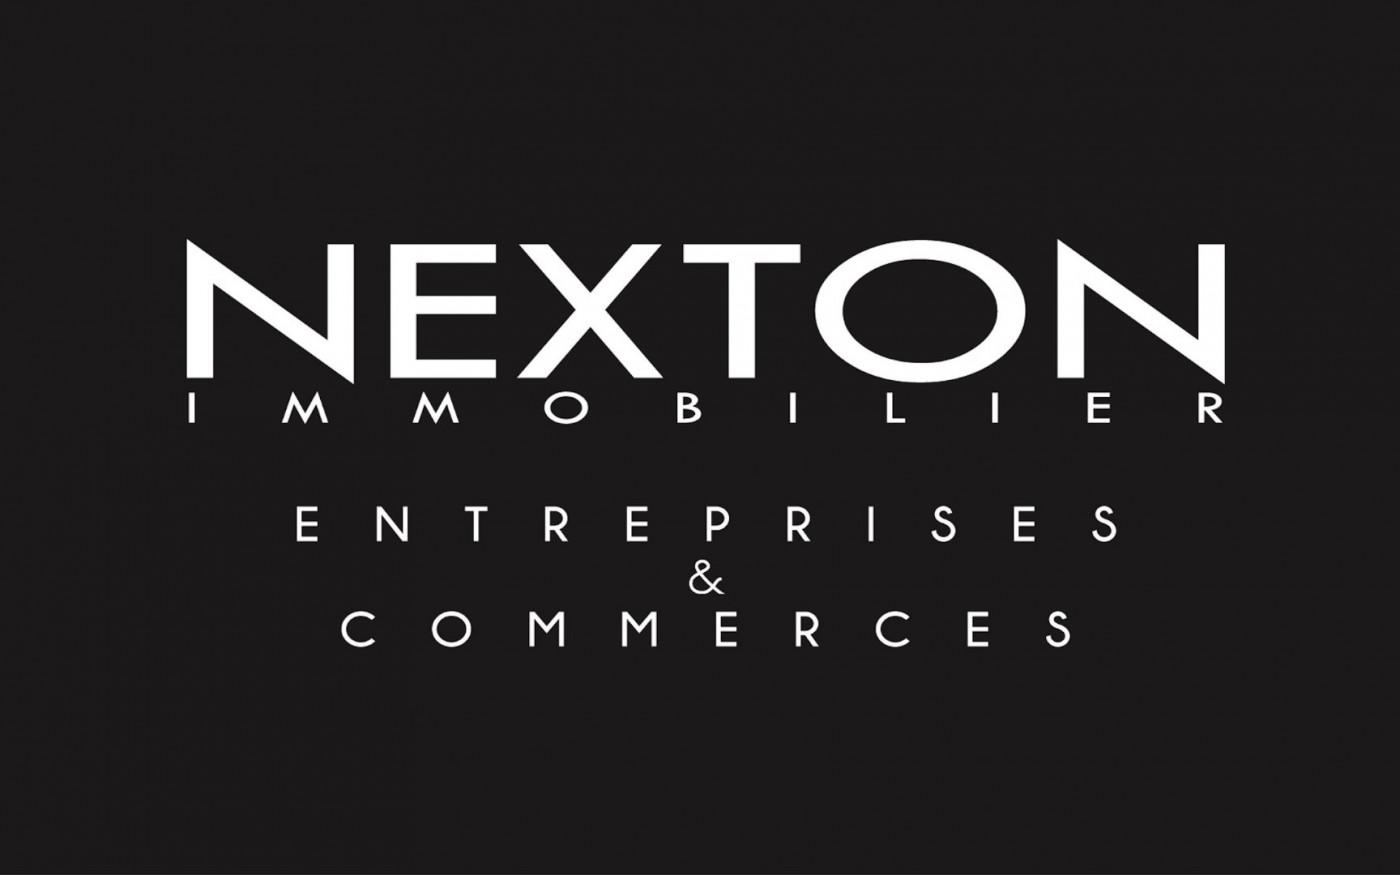 A vendre  Capbreton | Réf 40012174 - Nexton immobilier